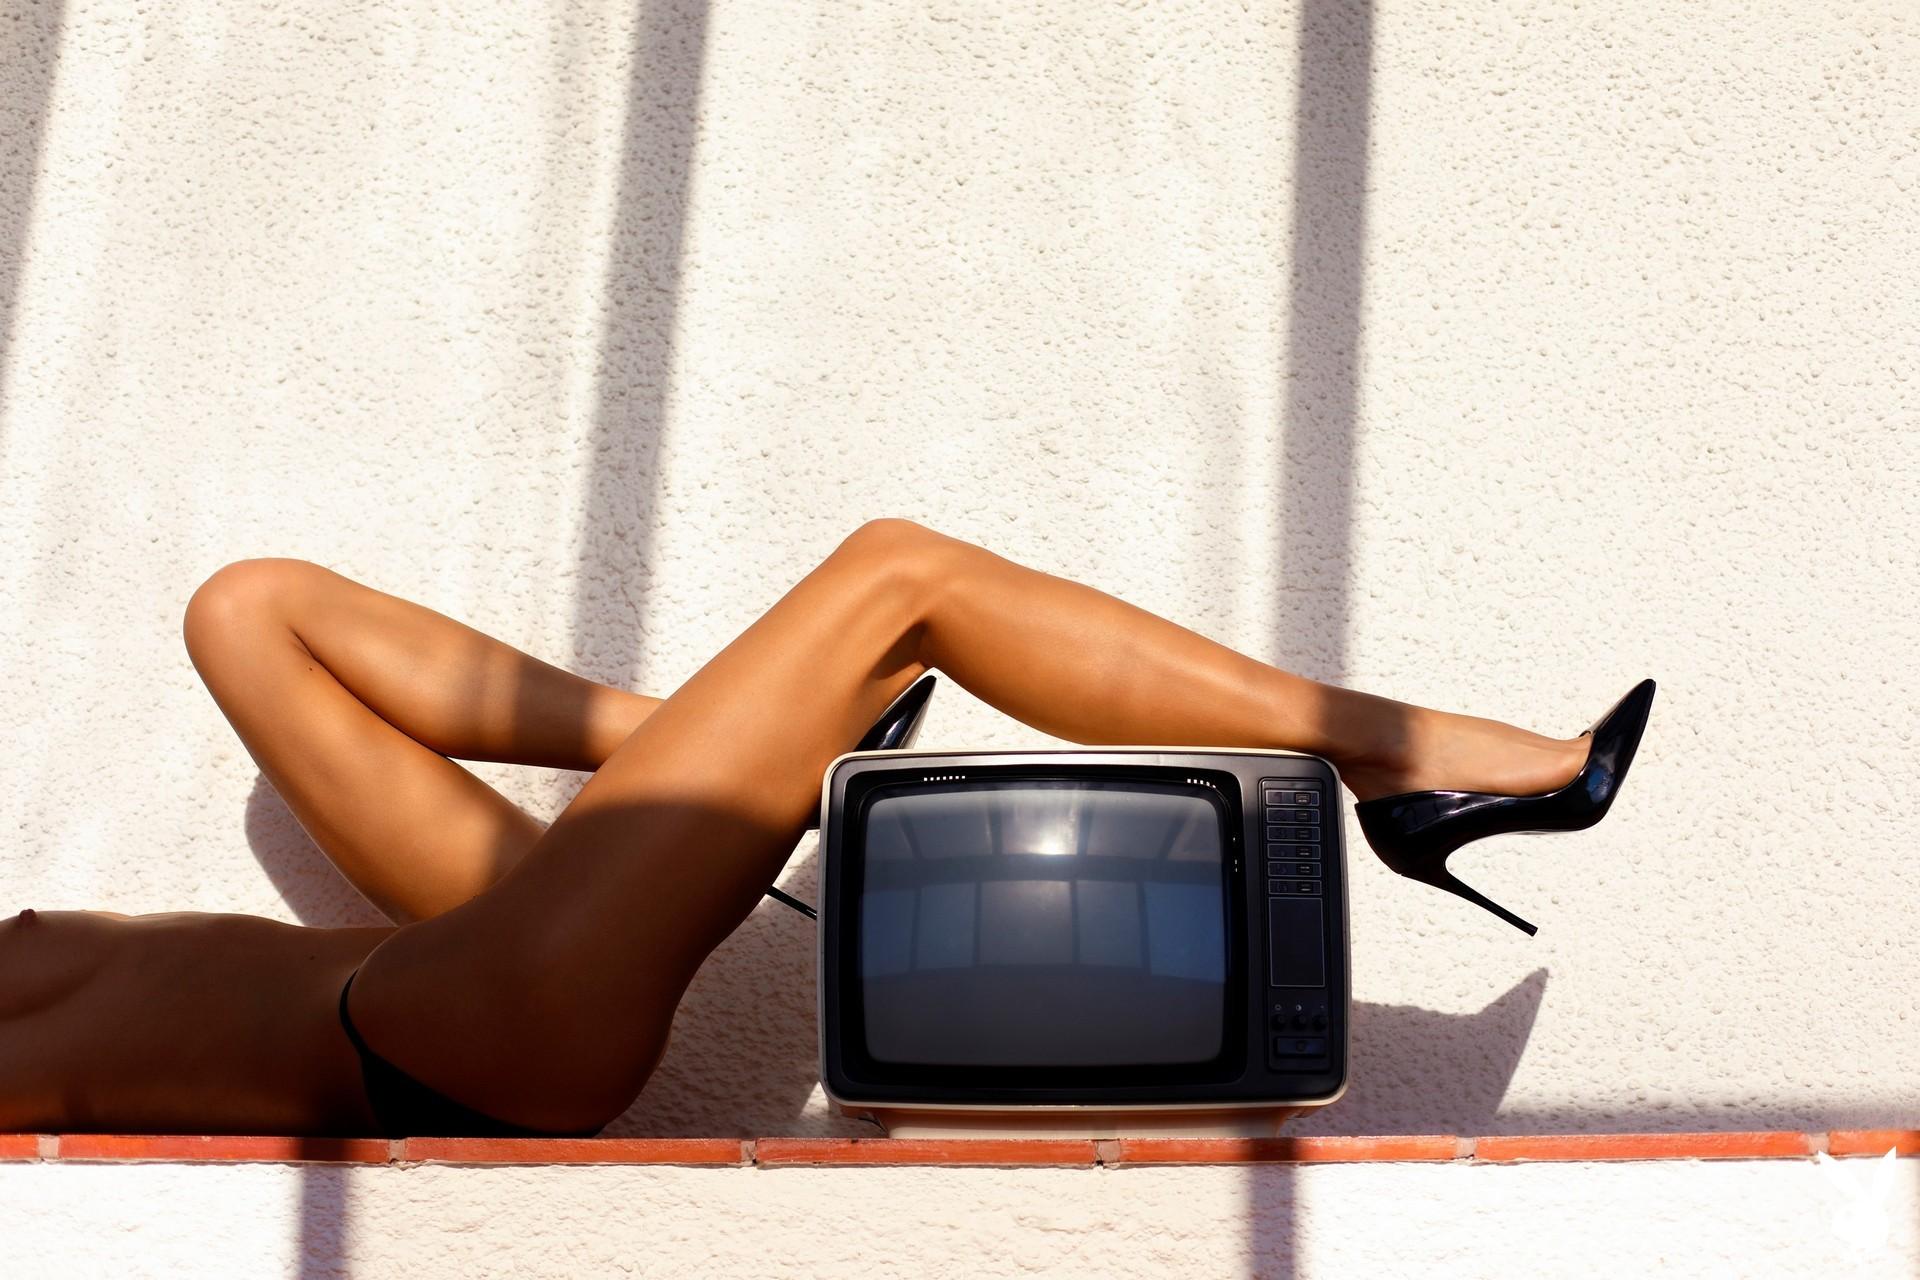 Cledia Fortin For Playboy International Playboy Plus (3)